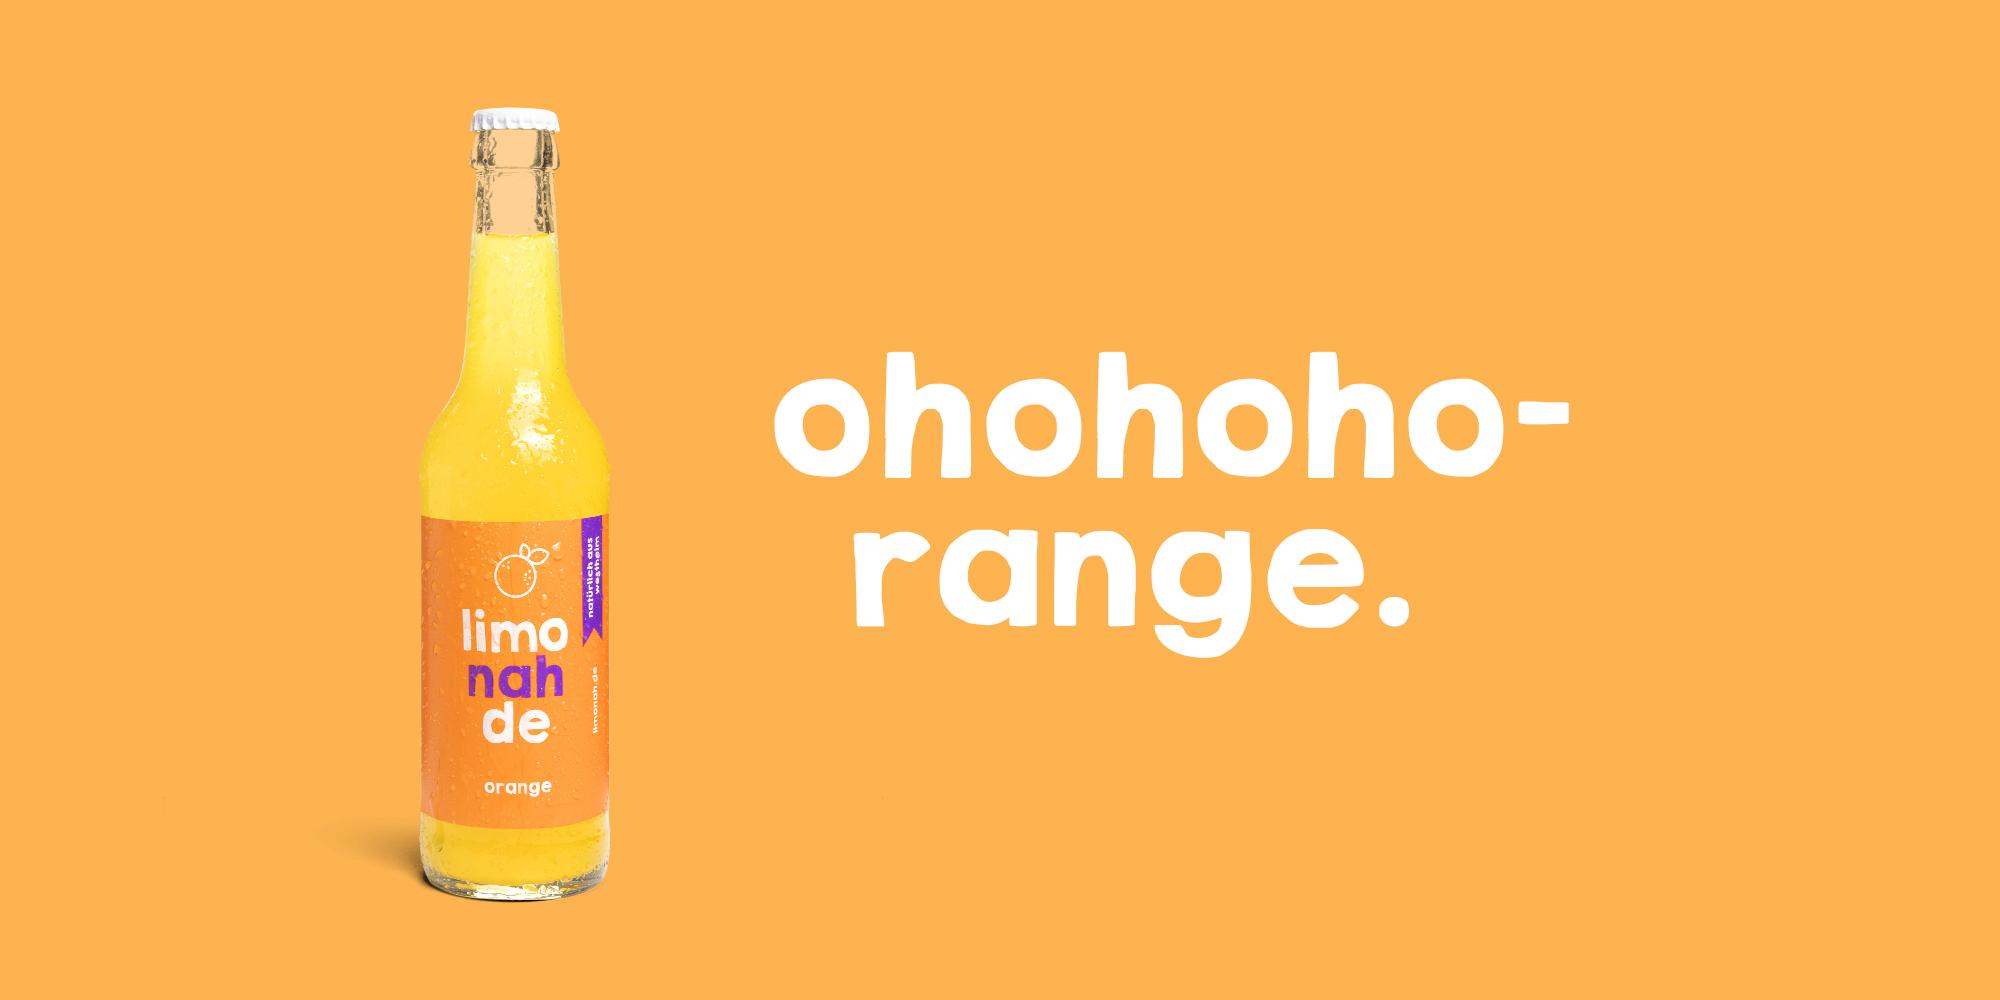 limonahde_orange-2